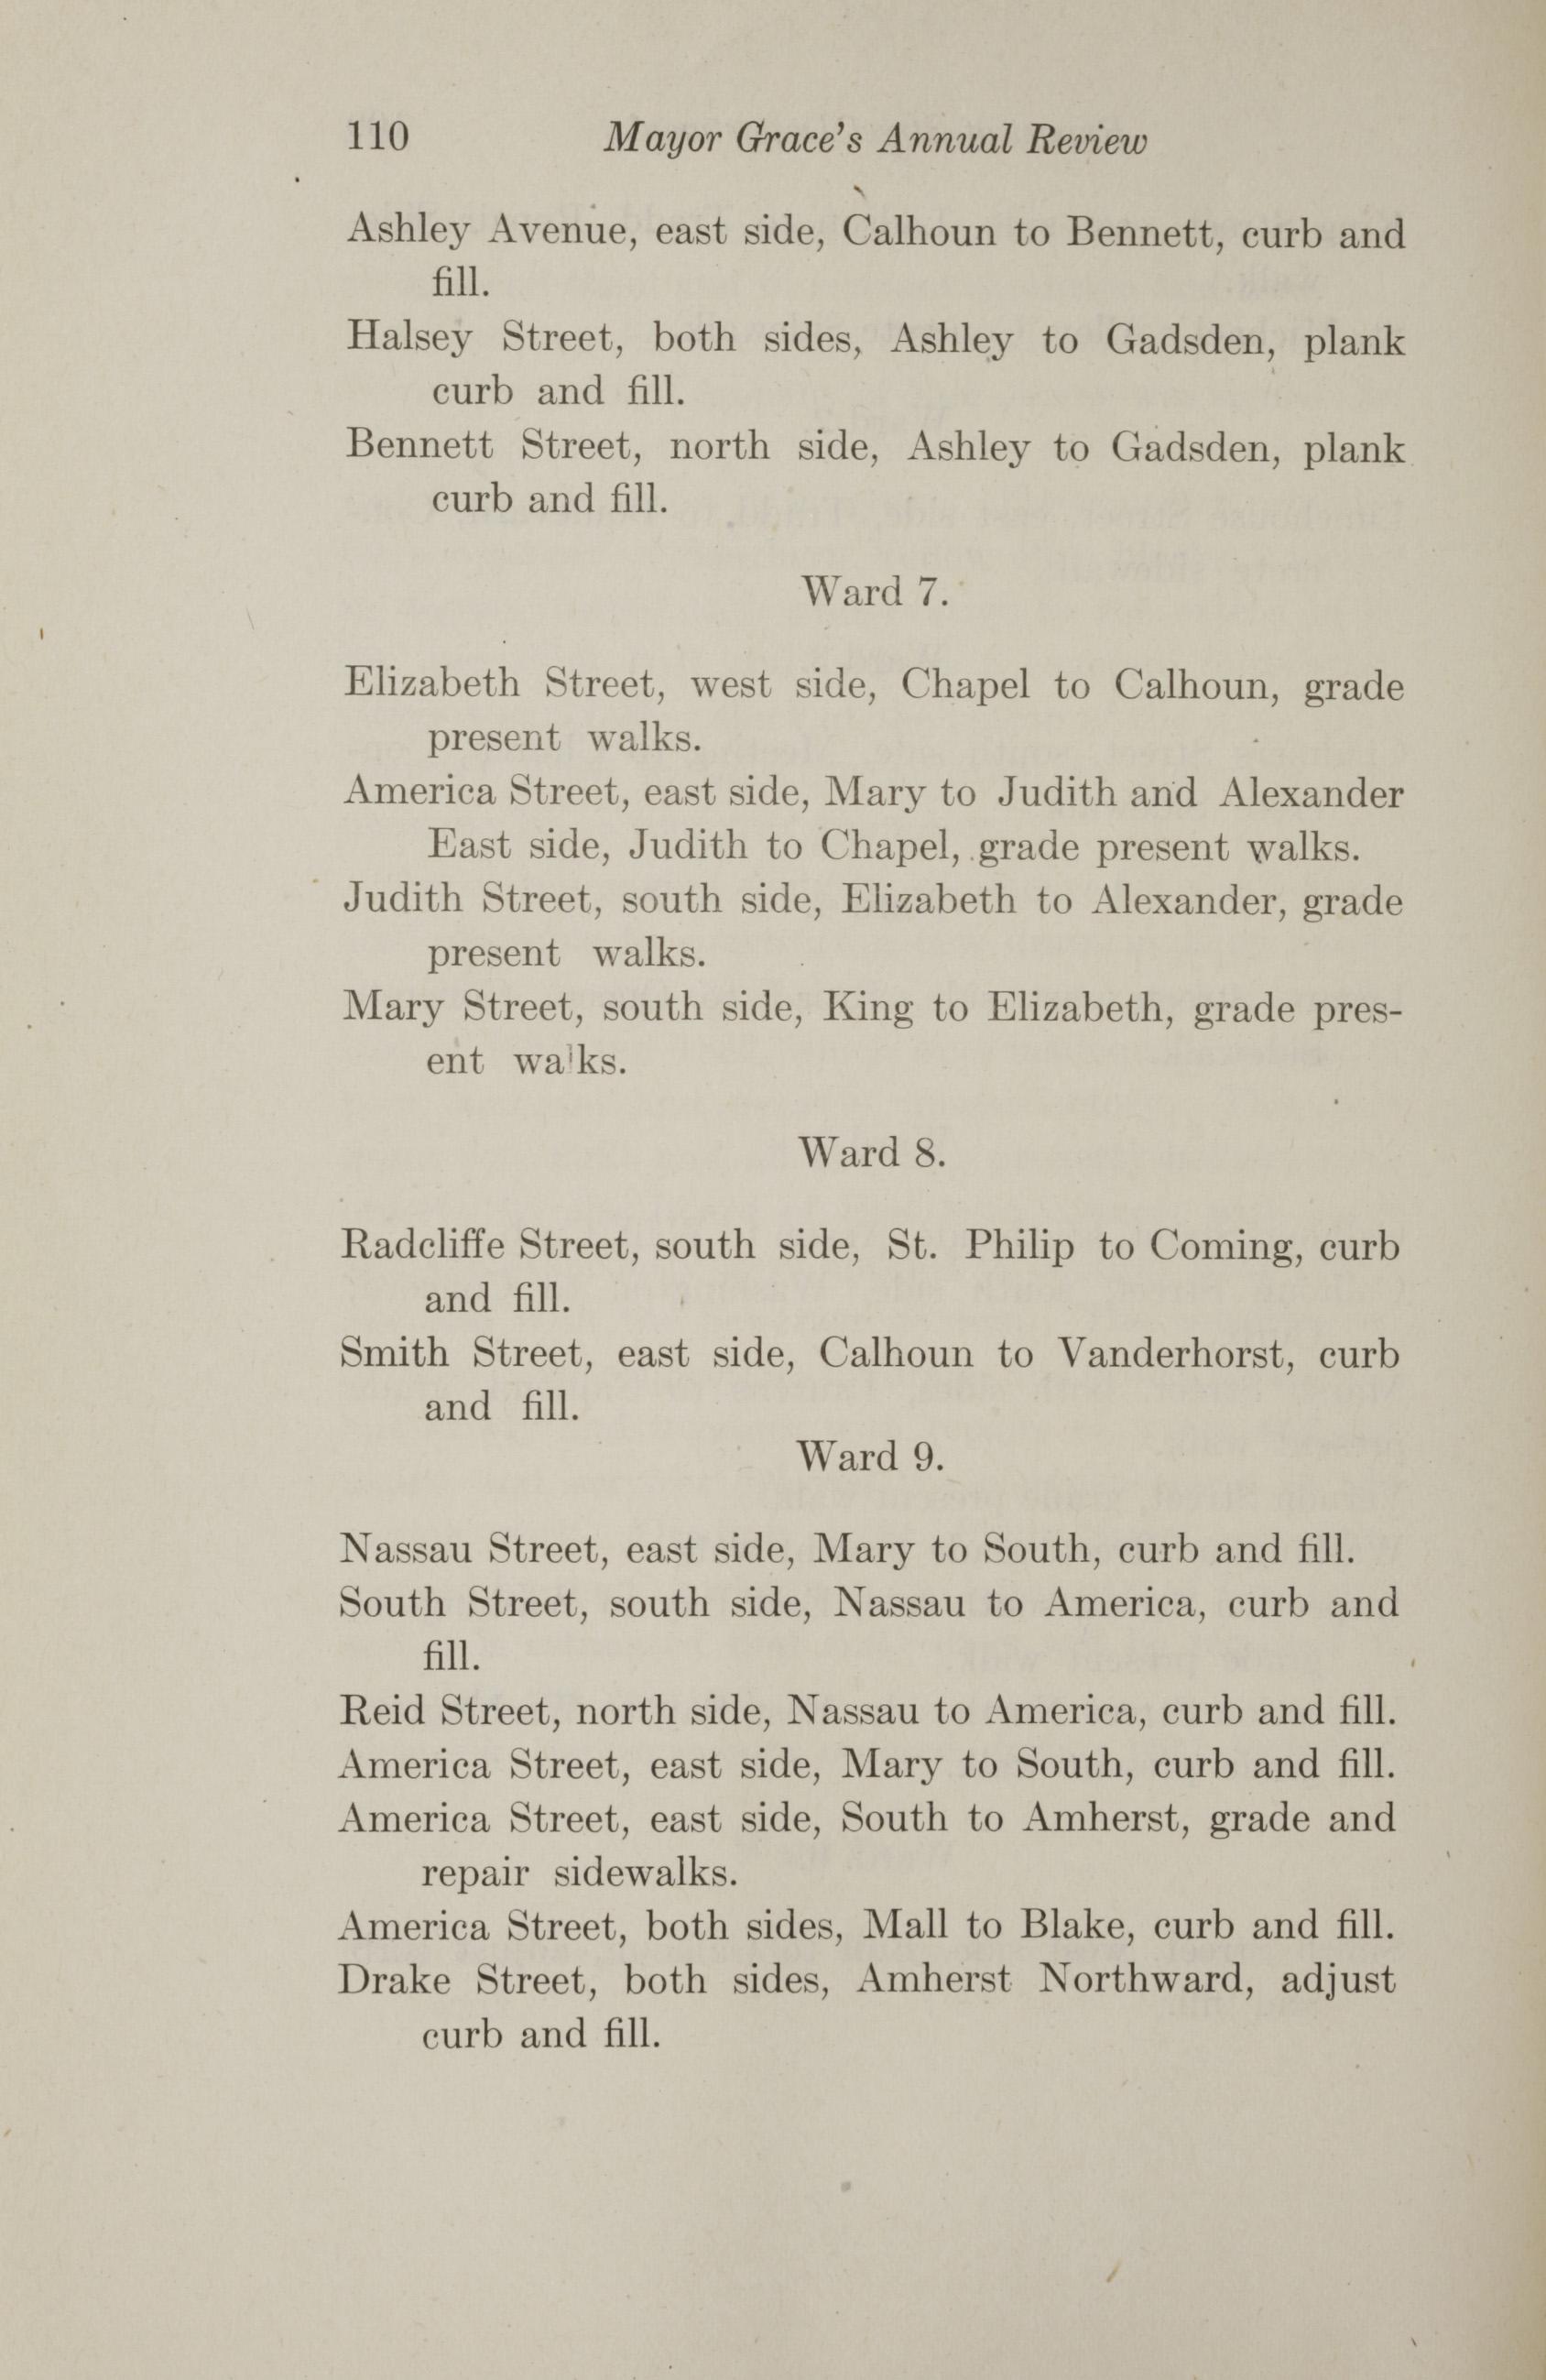 Charleston Yearbook, 1912, page 110